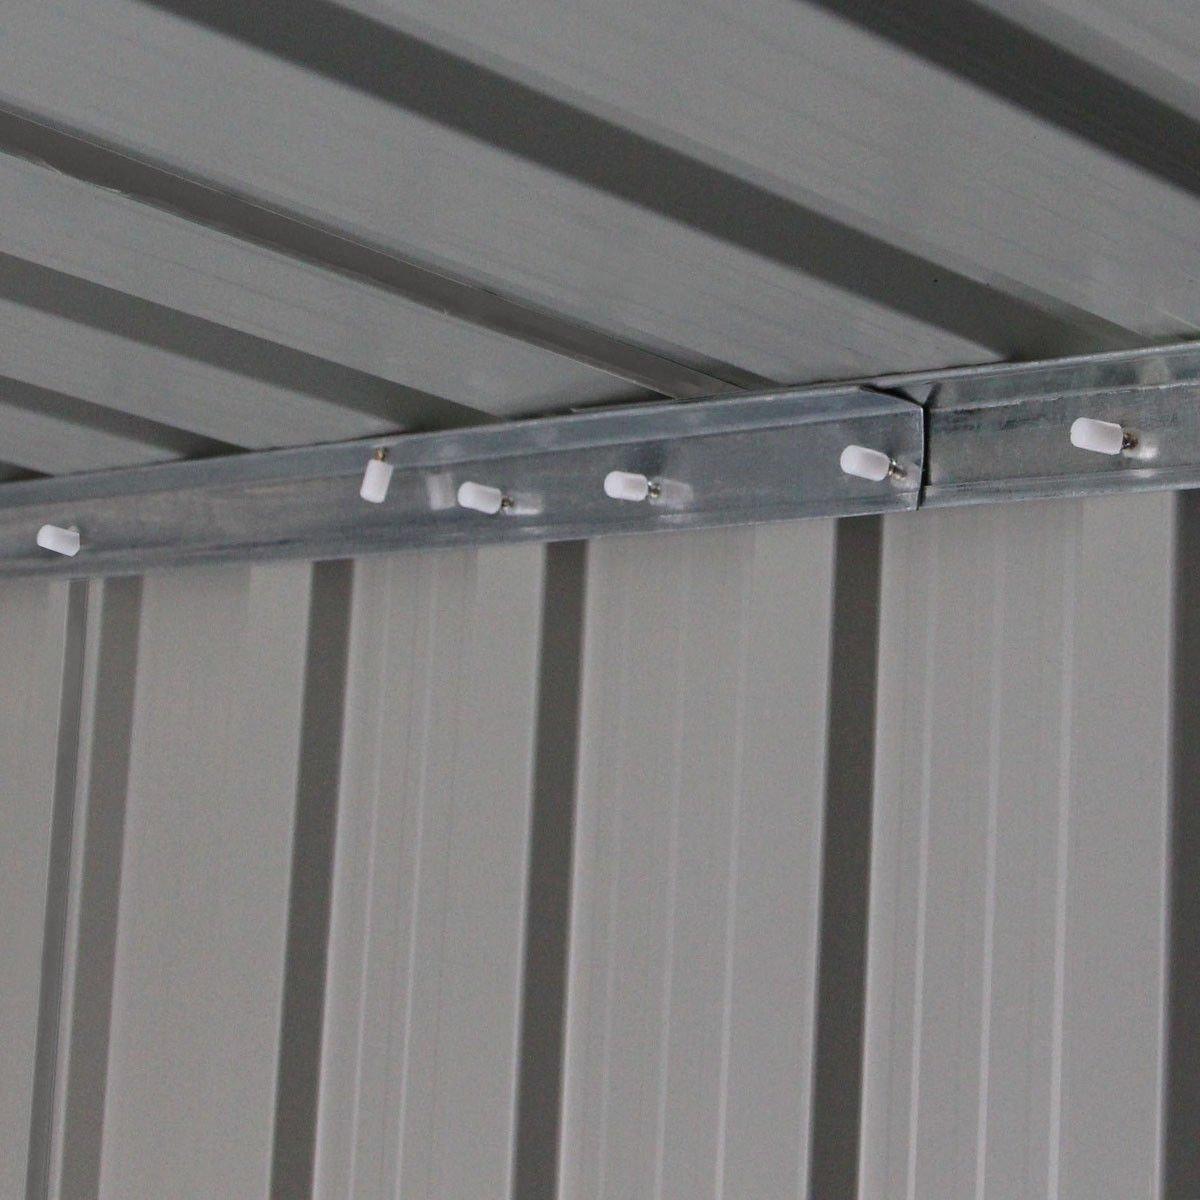 9' X 6' Outdoor Garden Storage Shed Tool House Sliding Door Steel Khaki New by tamsun (Image #8)